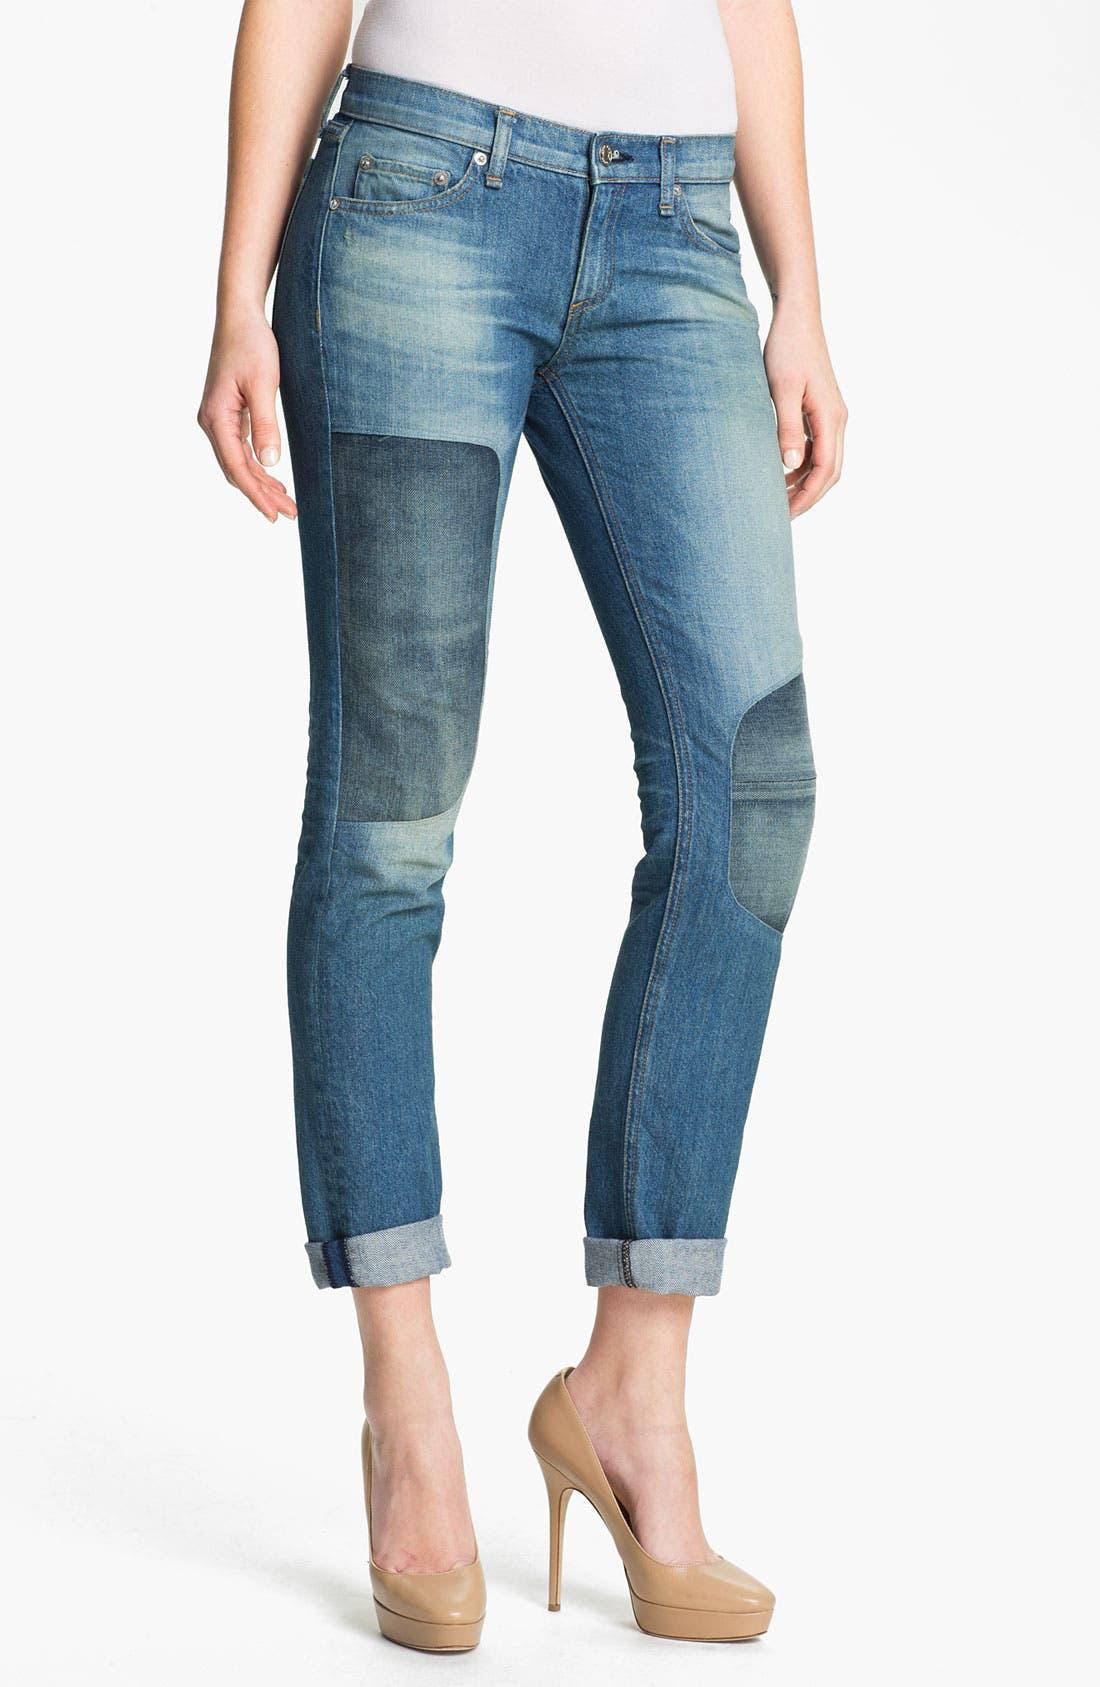 Alternate Image 1 Selected - rag & bone/JEAN 'The Dre' Patch Detail Rigid Jeans